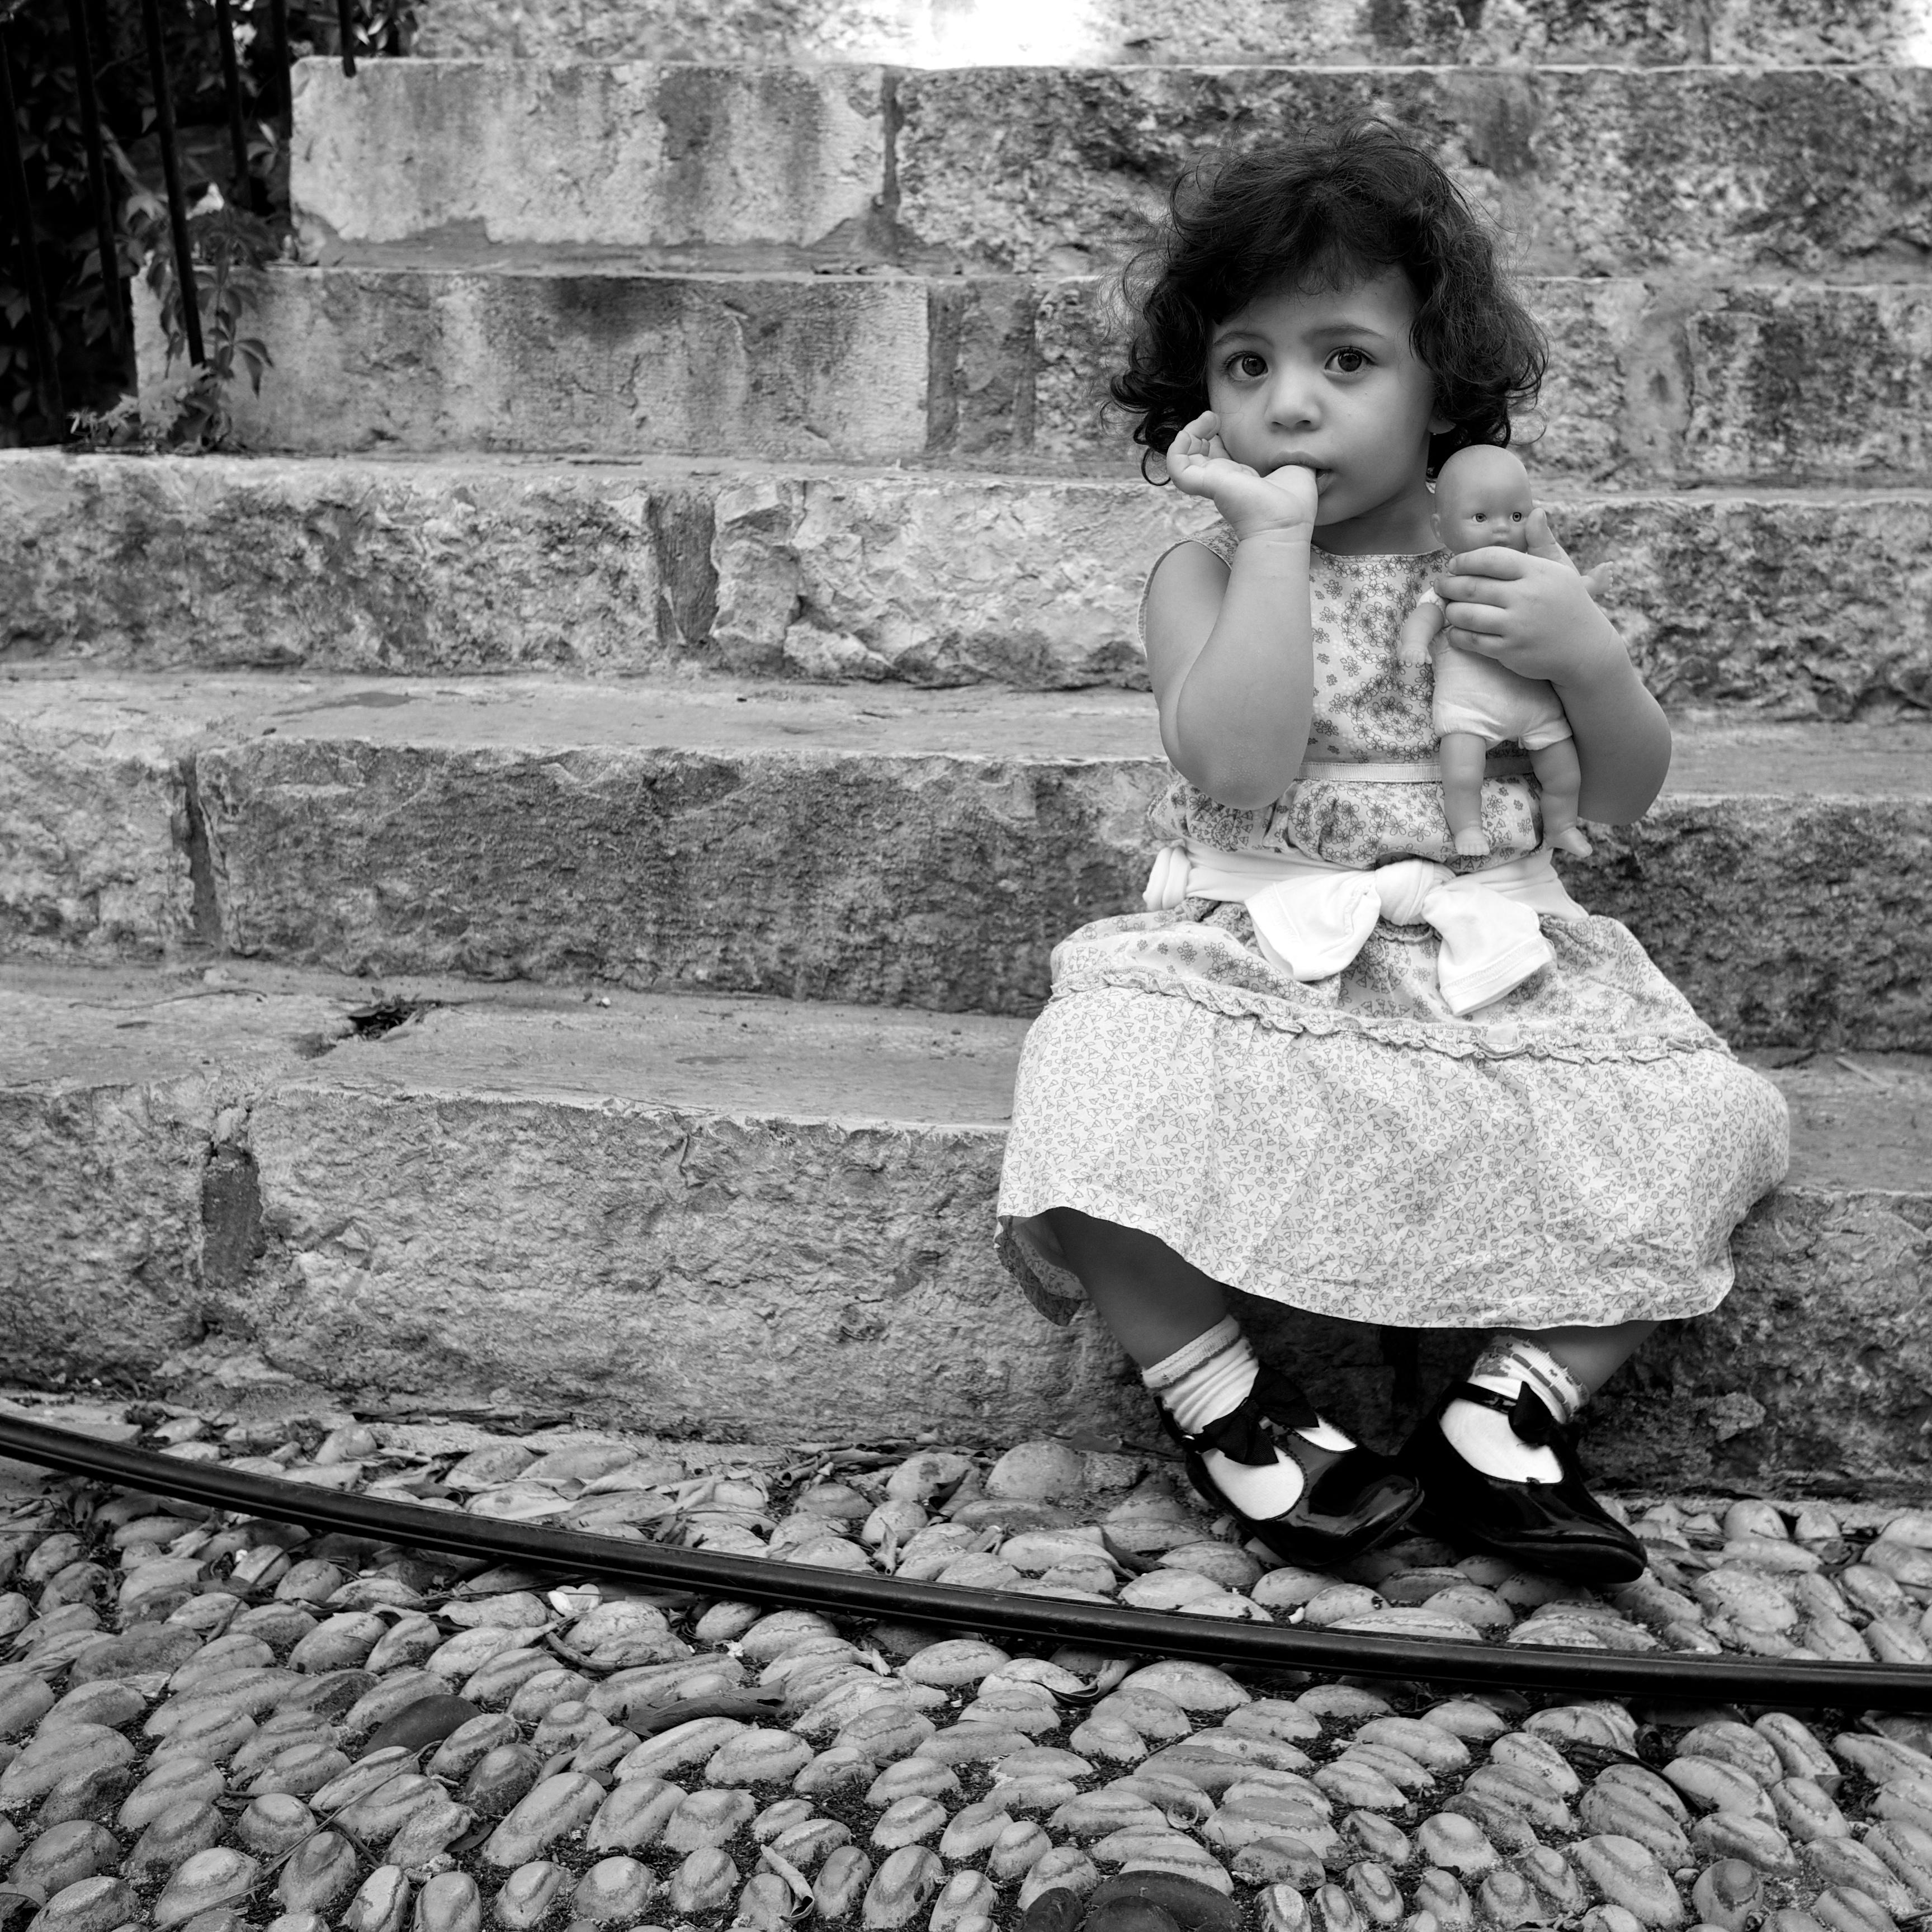 zwart meisje vids grote lullen wrijven